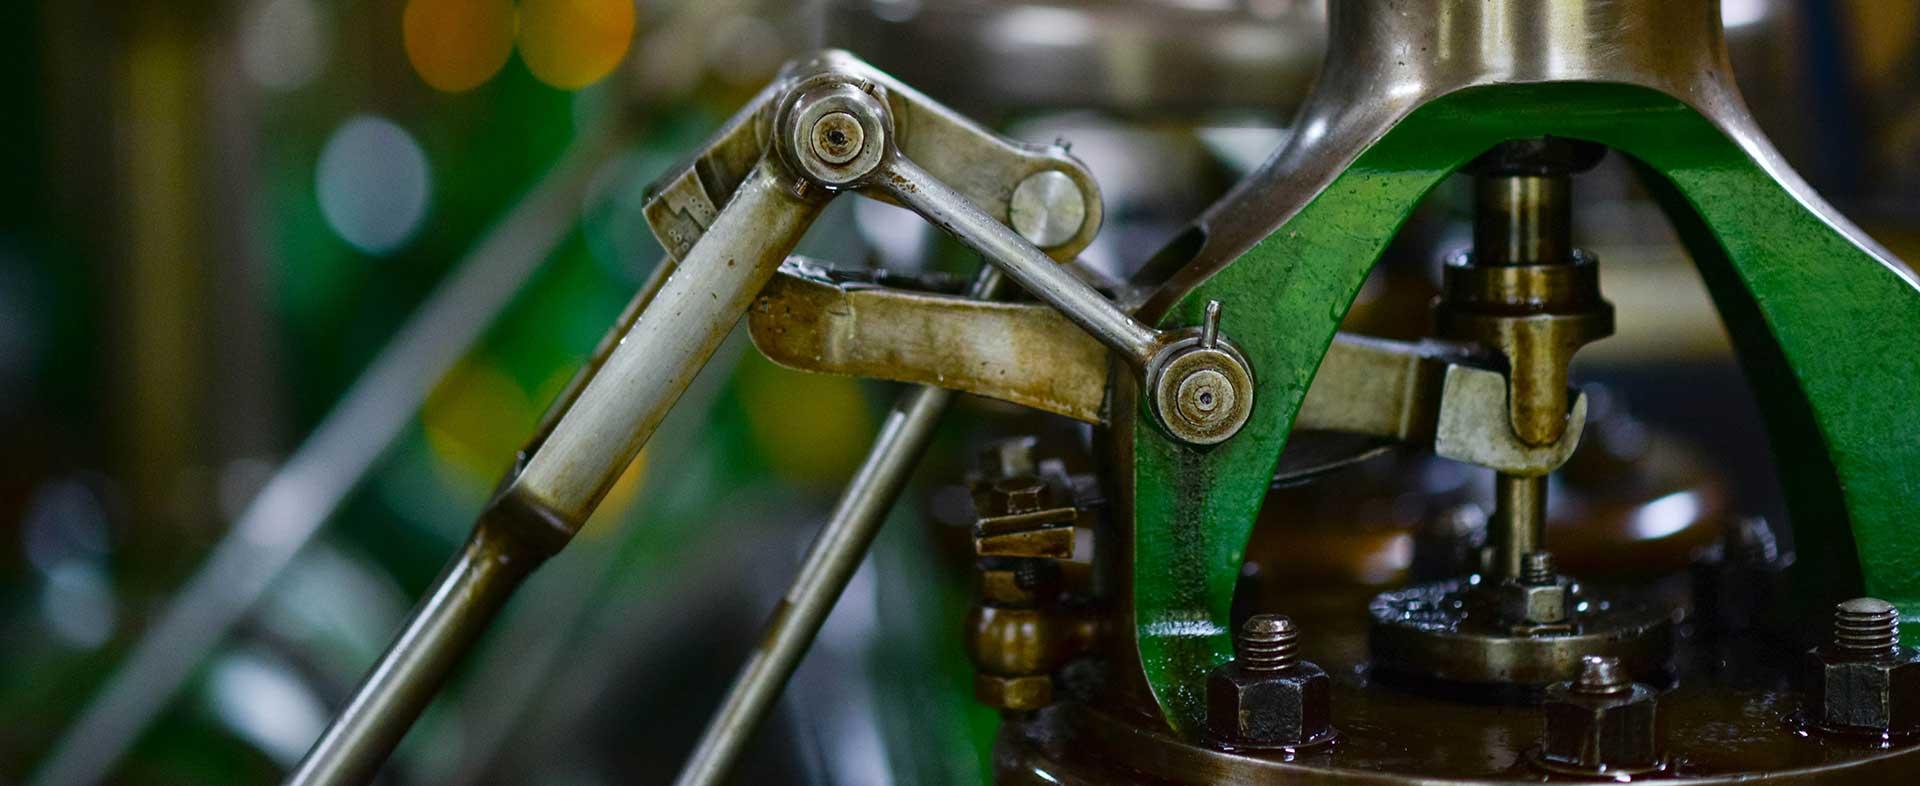 Fachübersetzung Maschinenbau Engineering Maschine